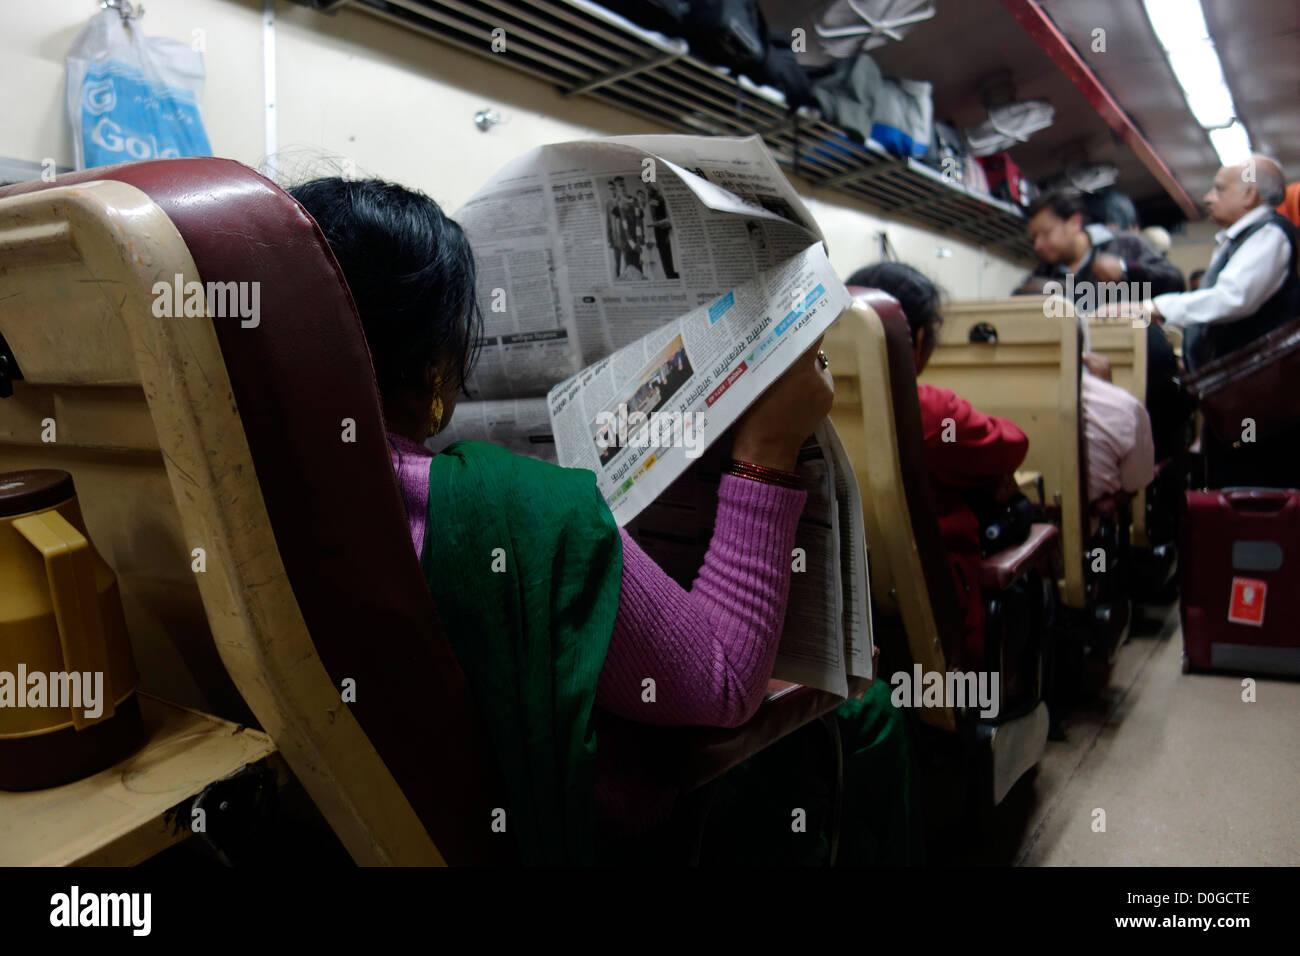 Railway Coach Stock Photos & Railway Coach Stock Images - Alamy